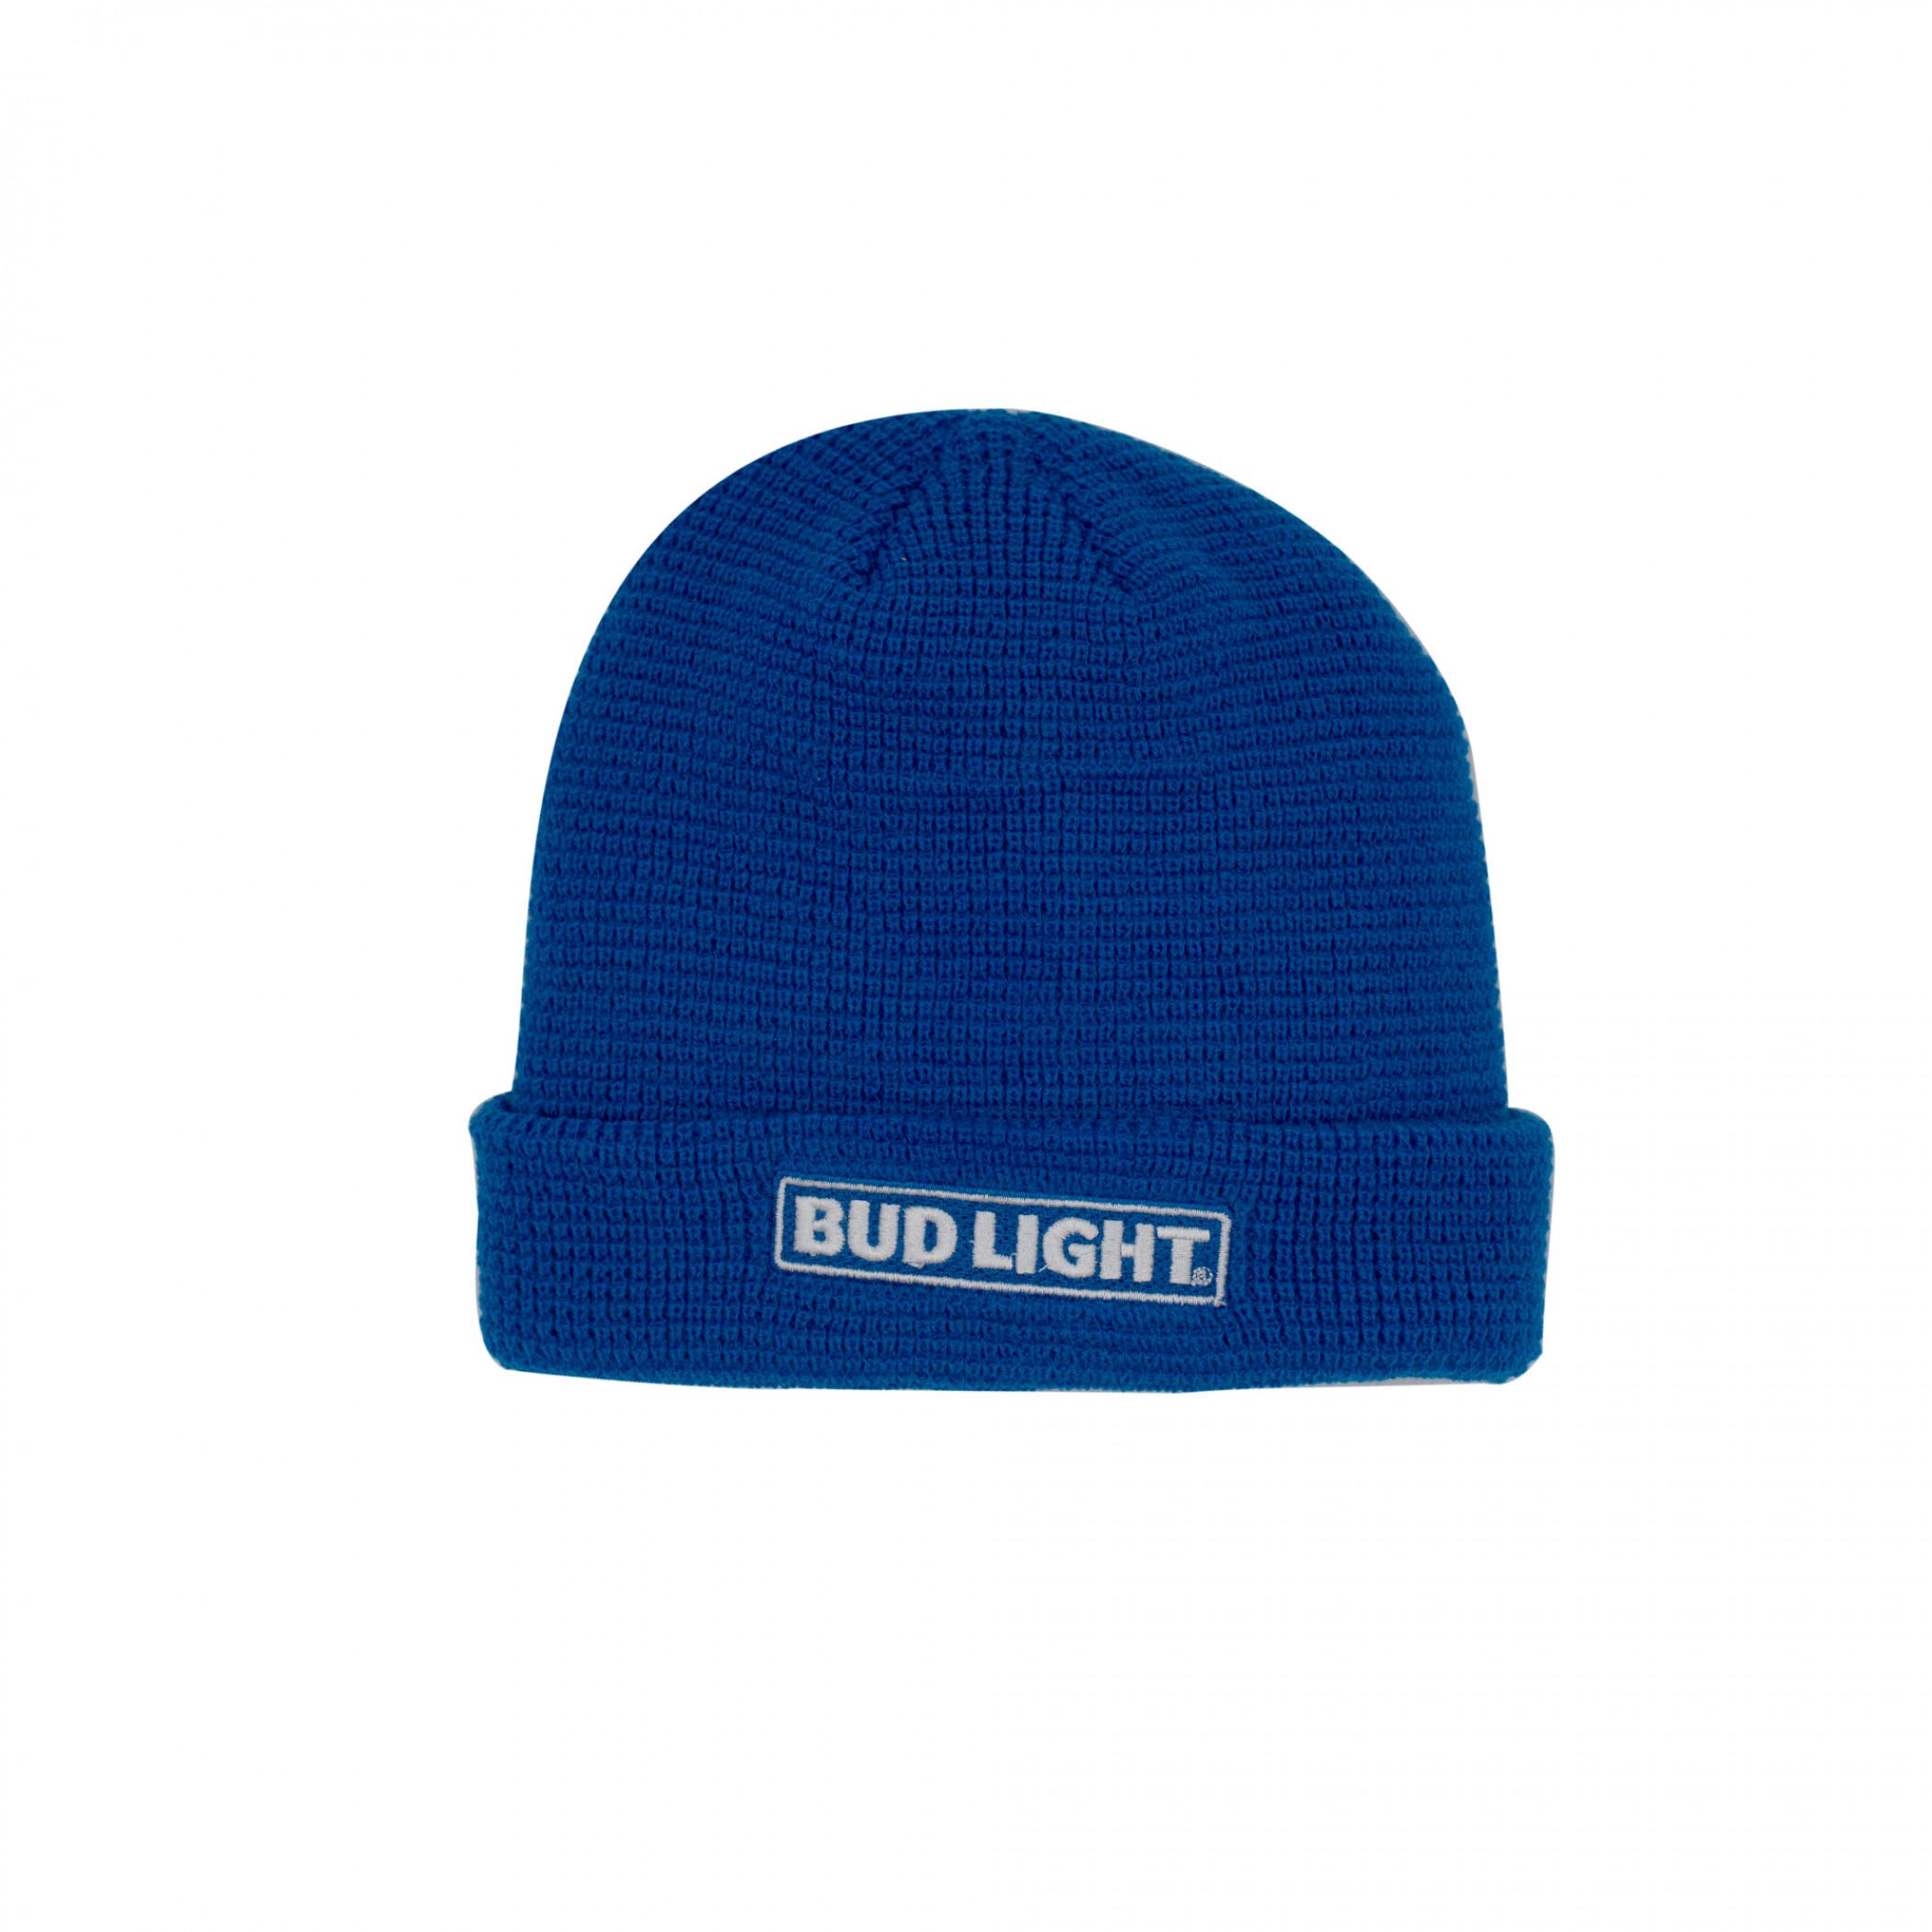 Bud Light Label Patch Knit Cuff Beanie